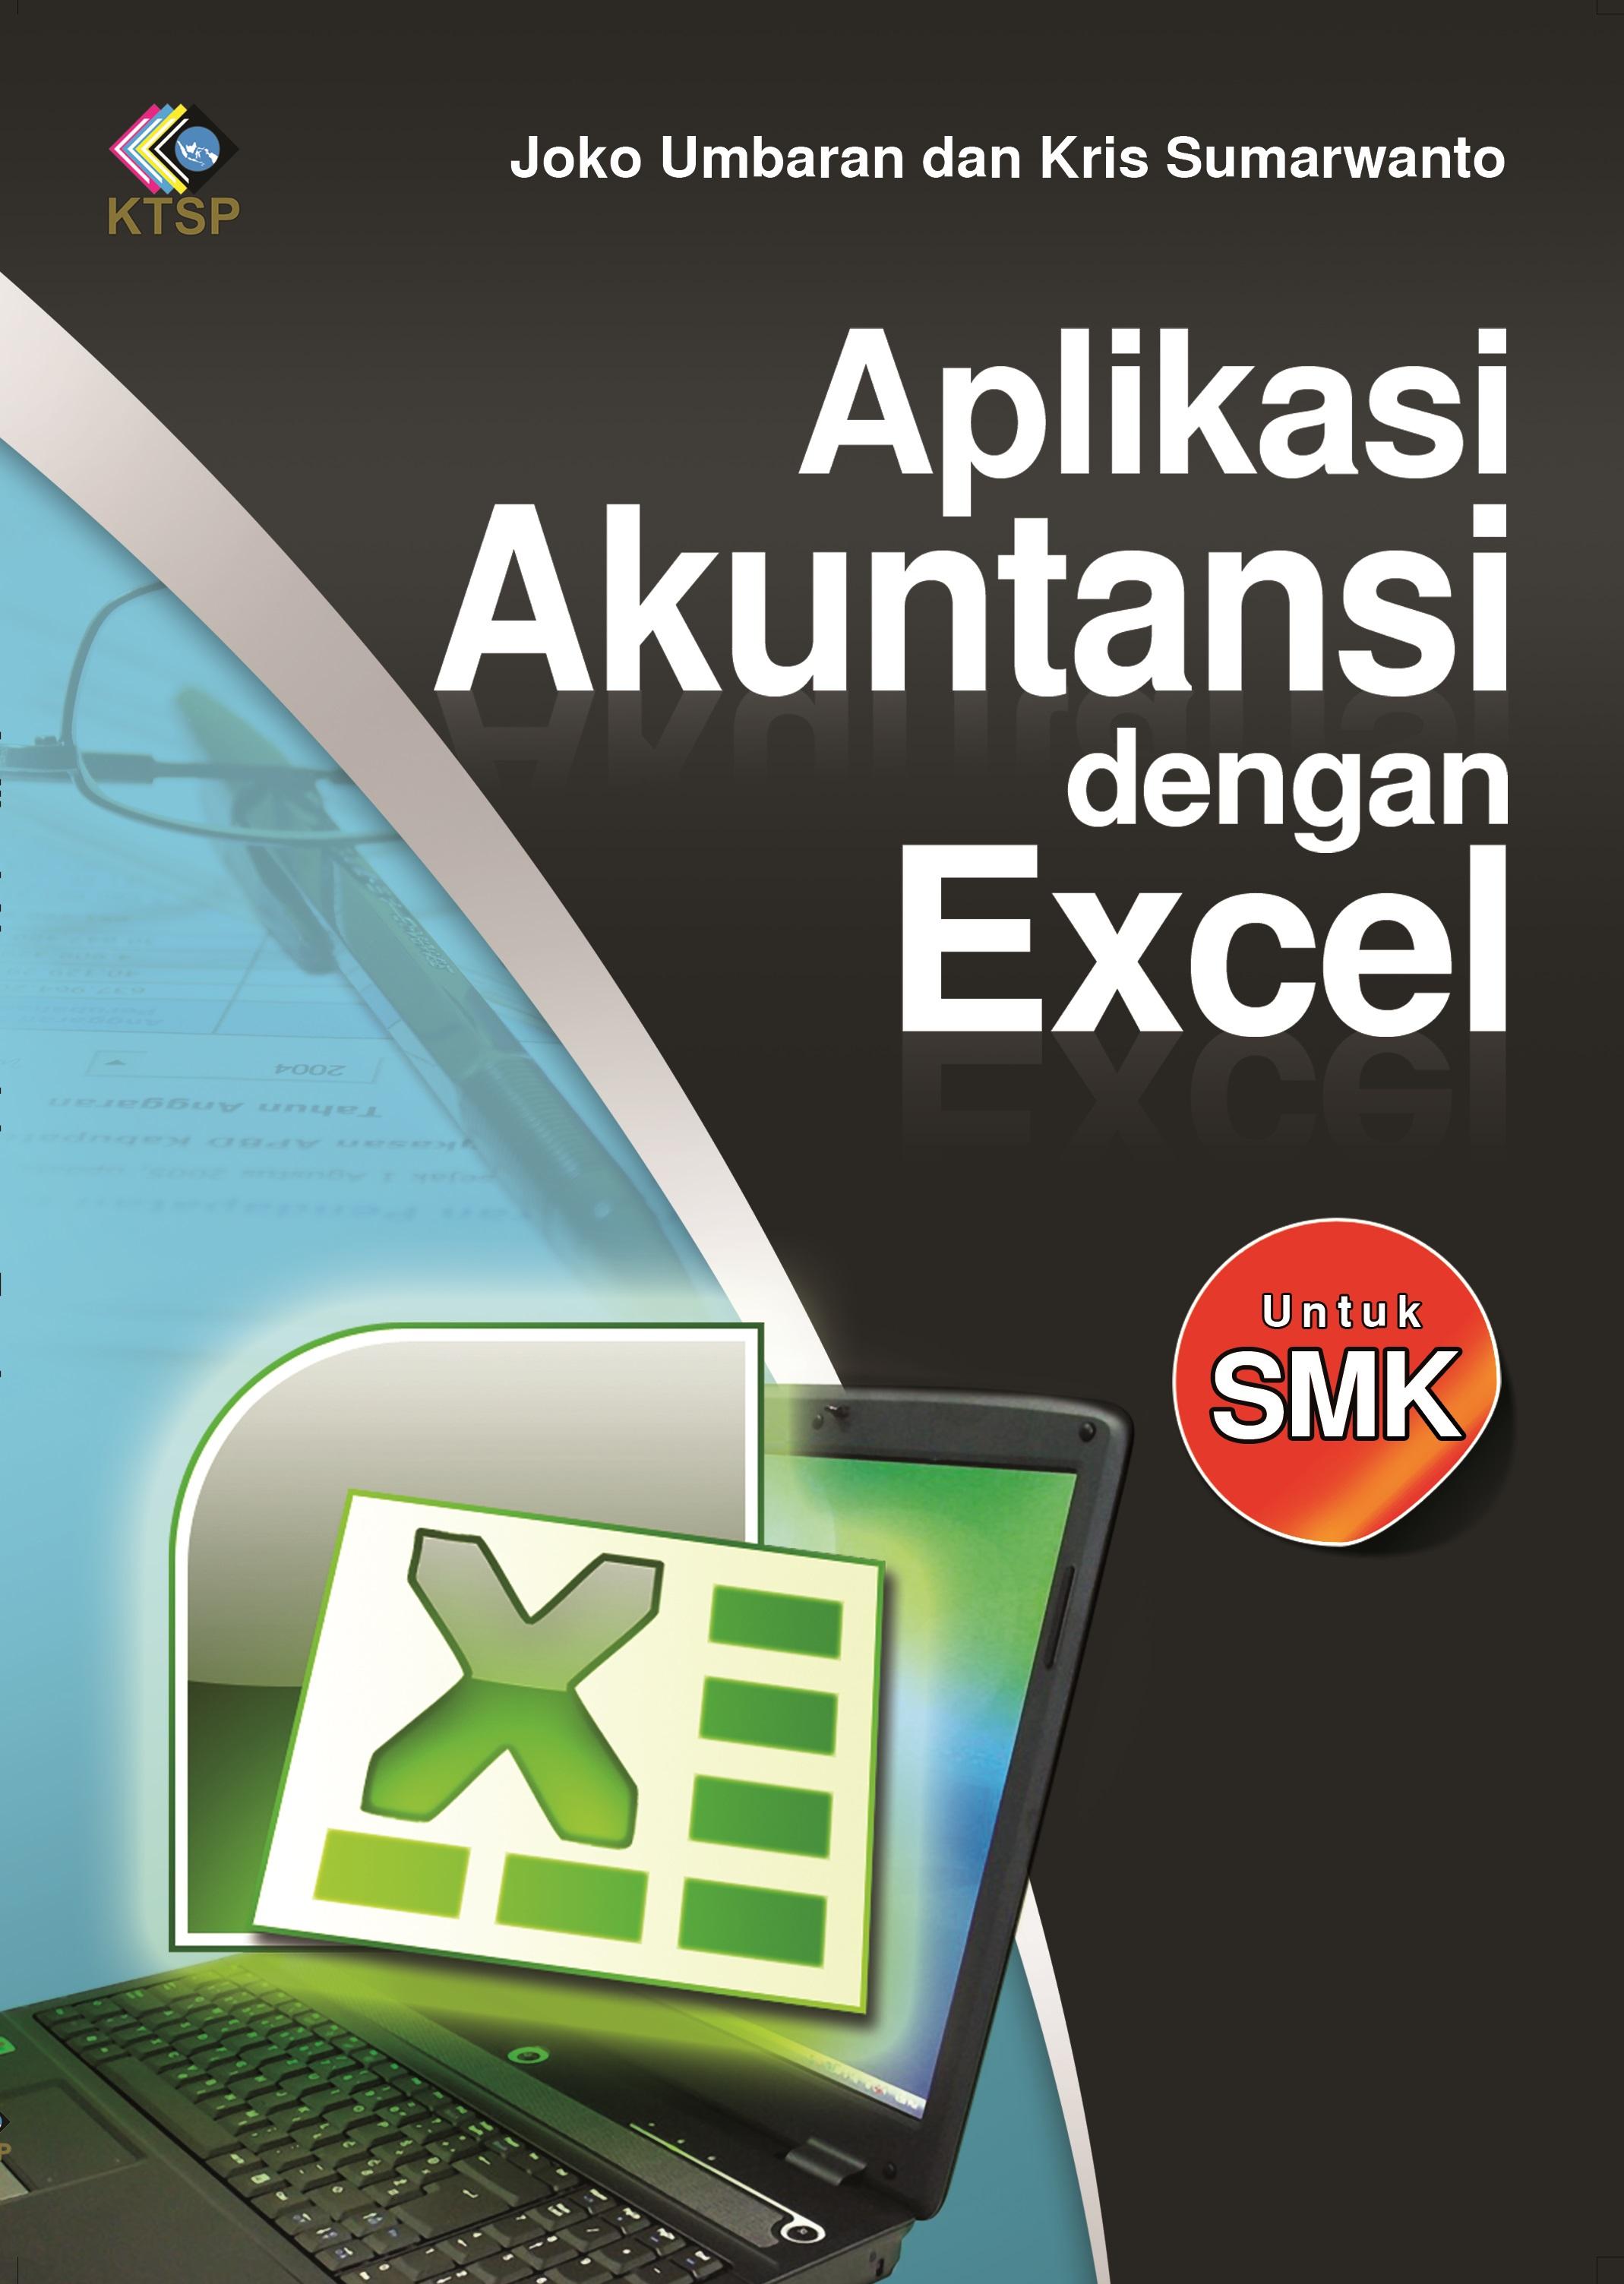 Aplikasi akuntansi dengan Excel [sumber elektronis]